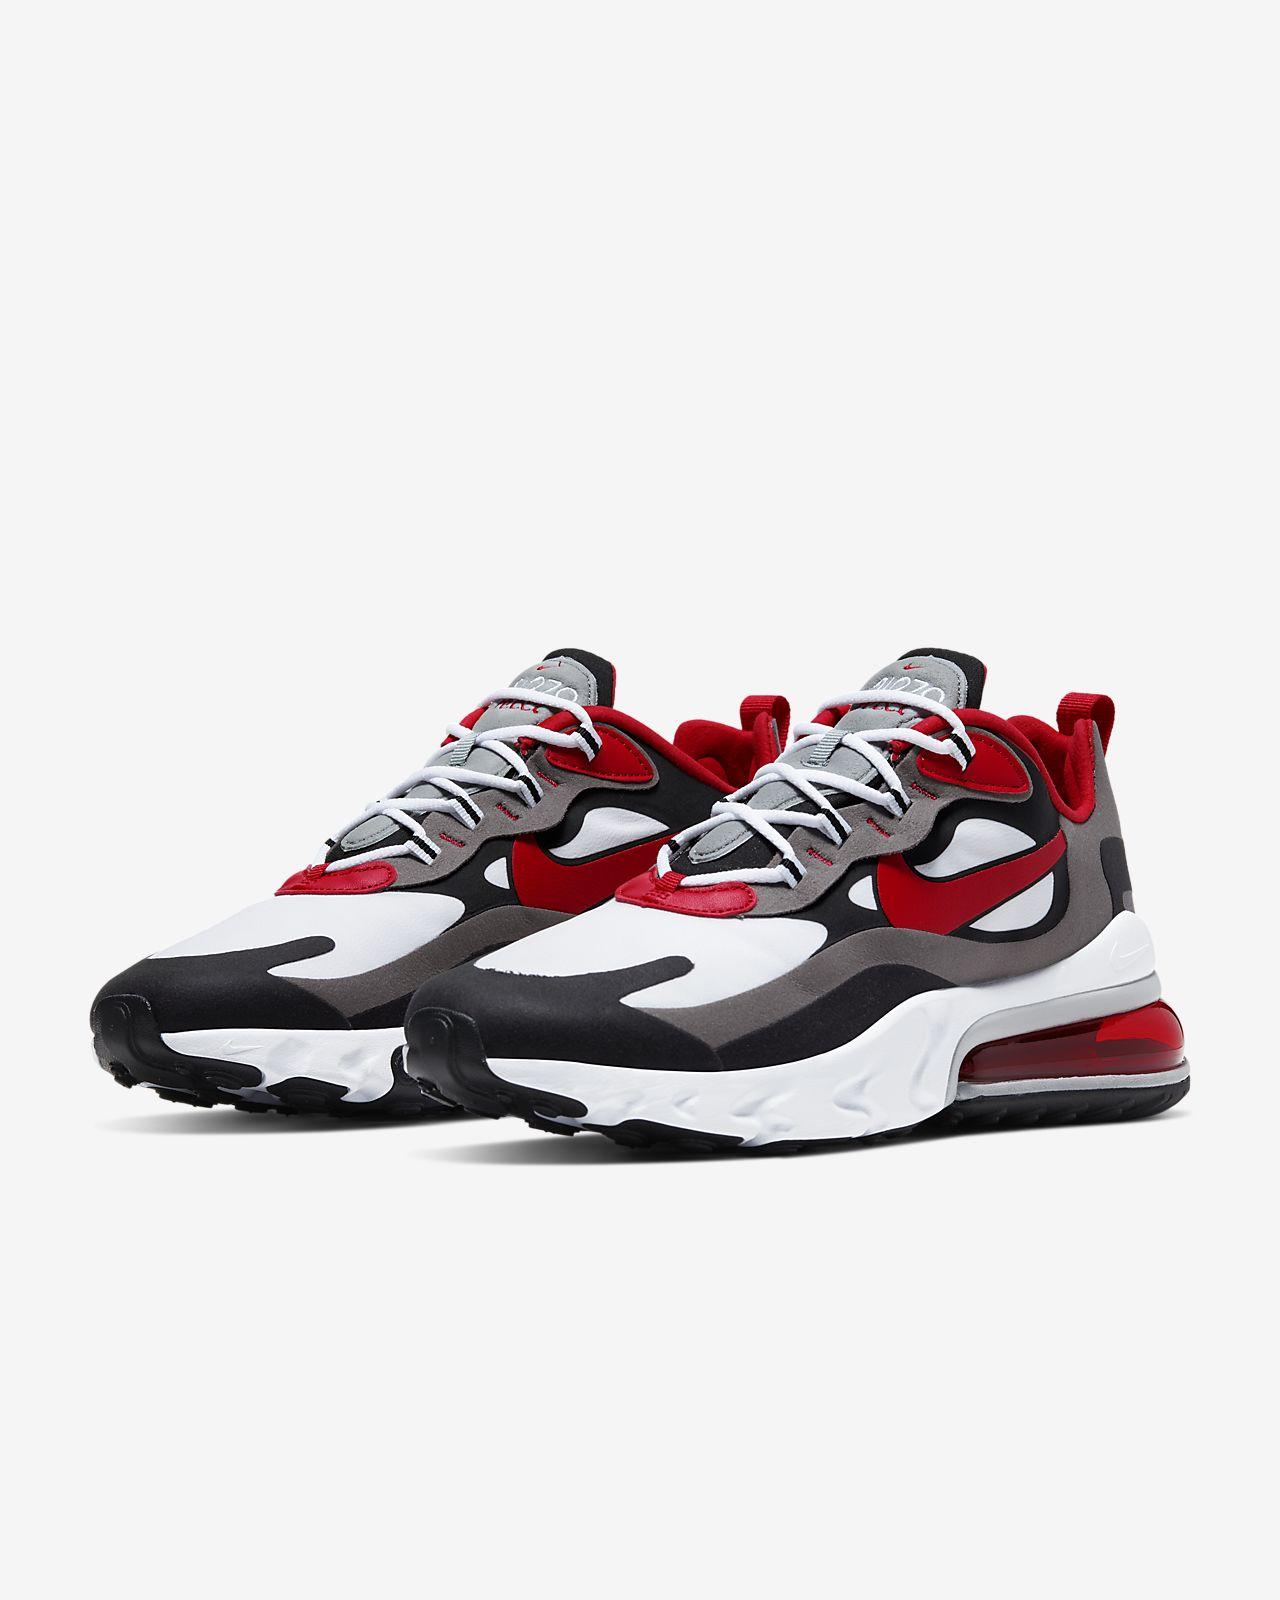 Calidad superior mejor lugar para super popular NIKE Official]Nike Air Max 270 React Men's Shoe.Online store (mail ...